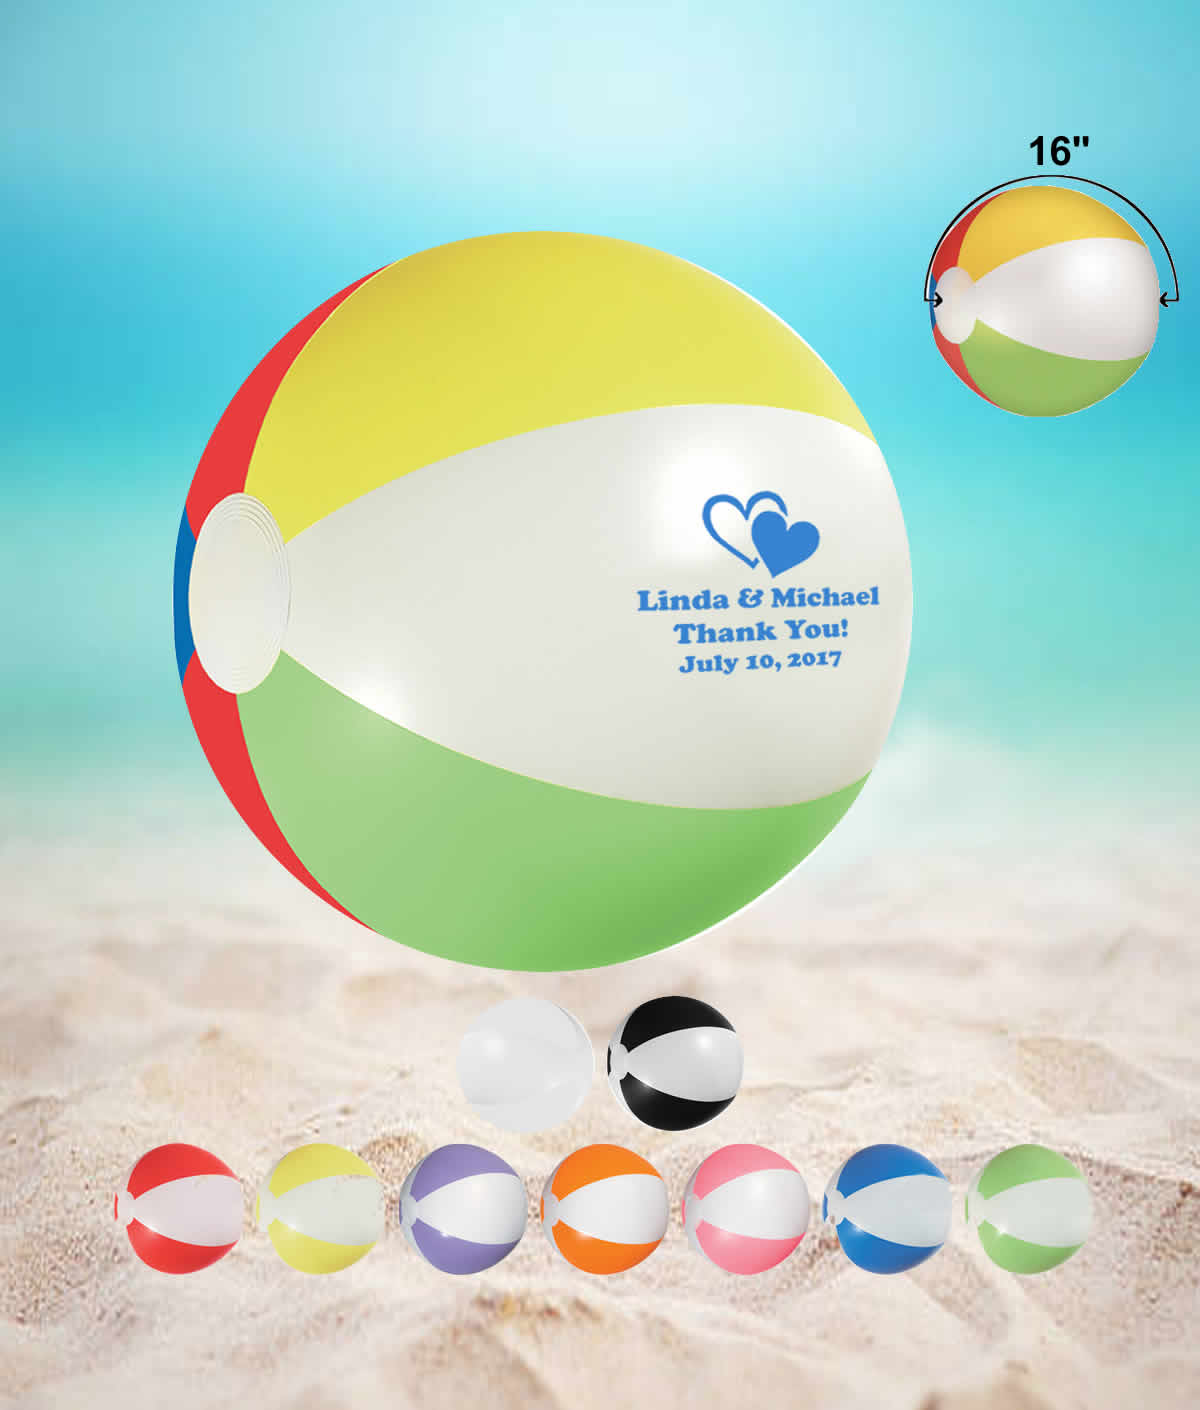 Beach Theme Party Ideas 16 Wedding Beach Balls Free Proofs No Setup Fees